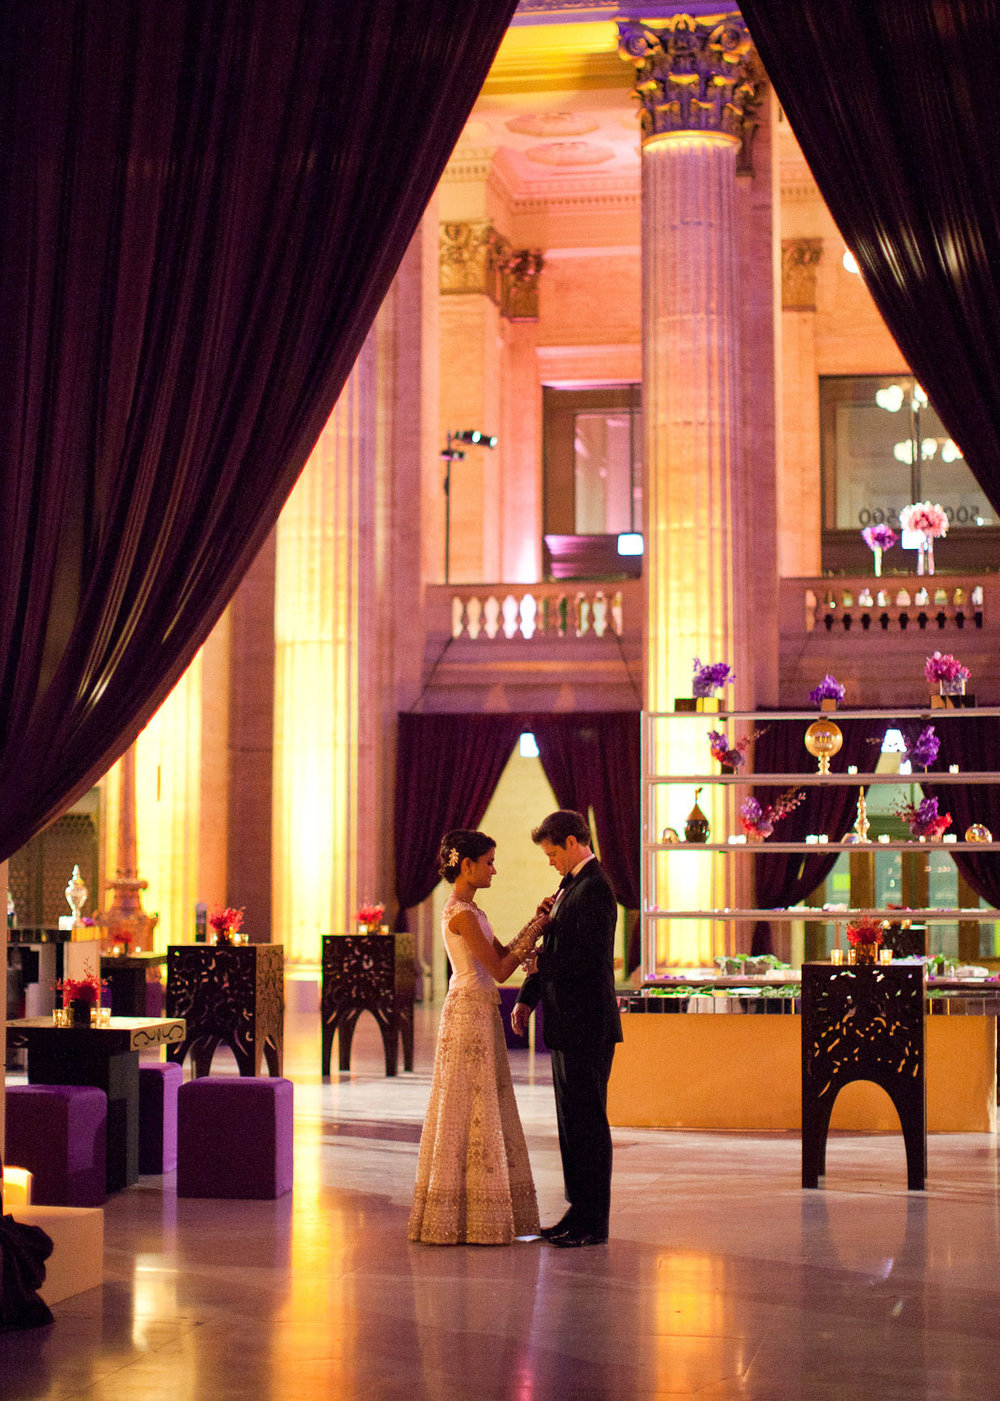 birch-bespoke-events-and-weddings-12.jpg